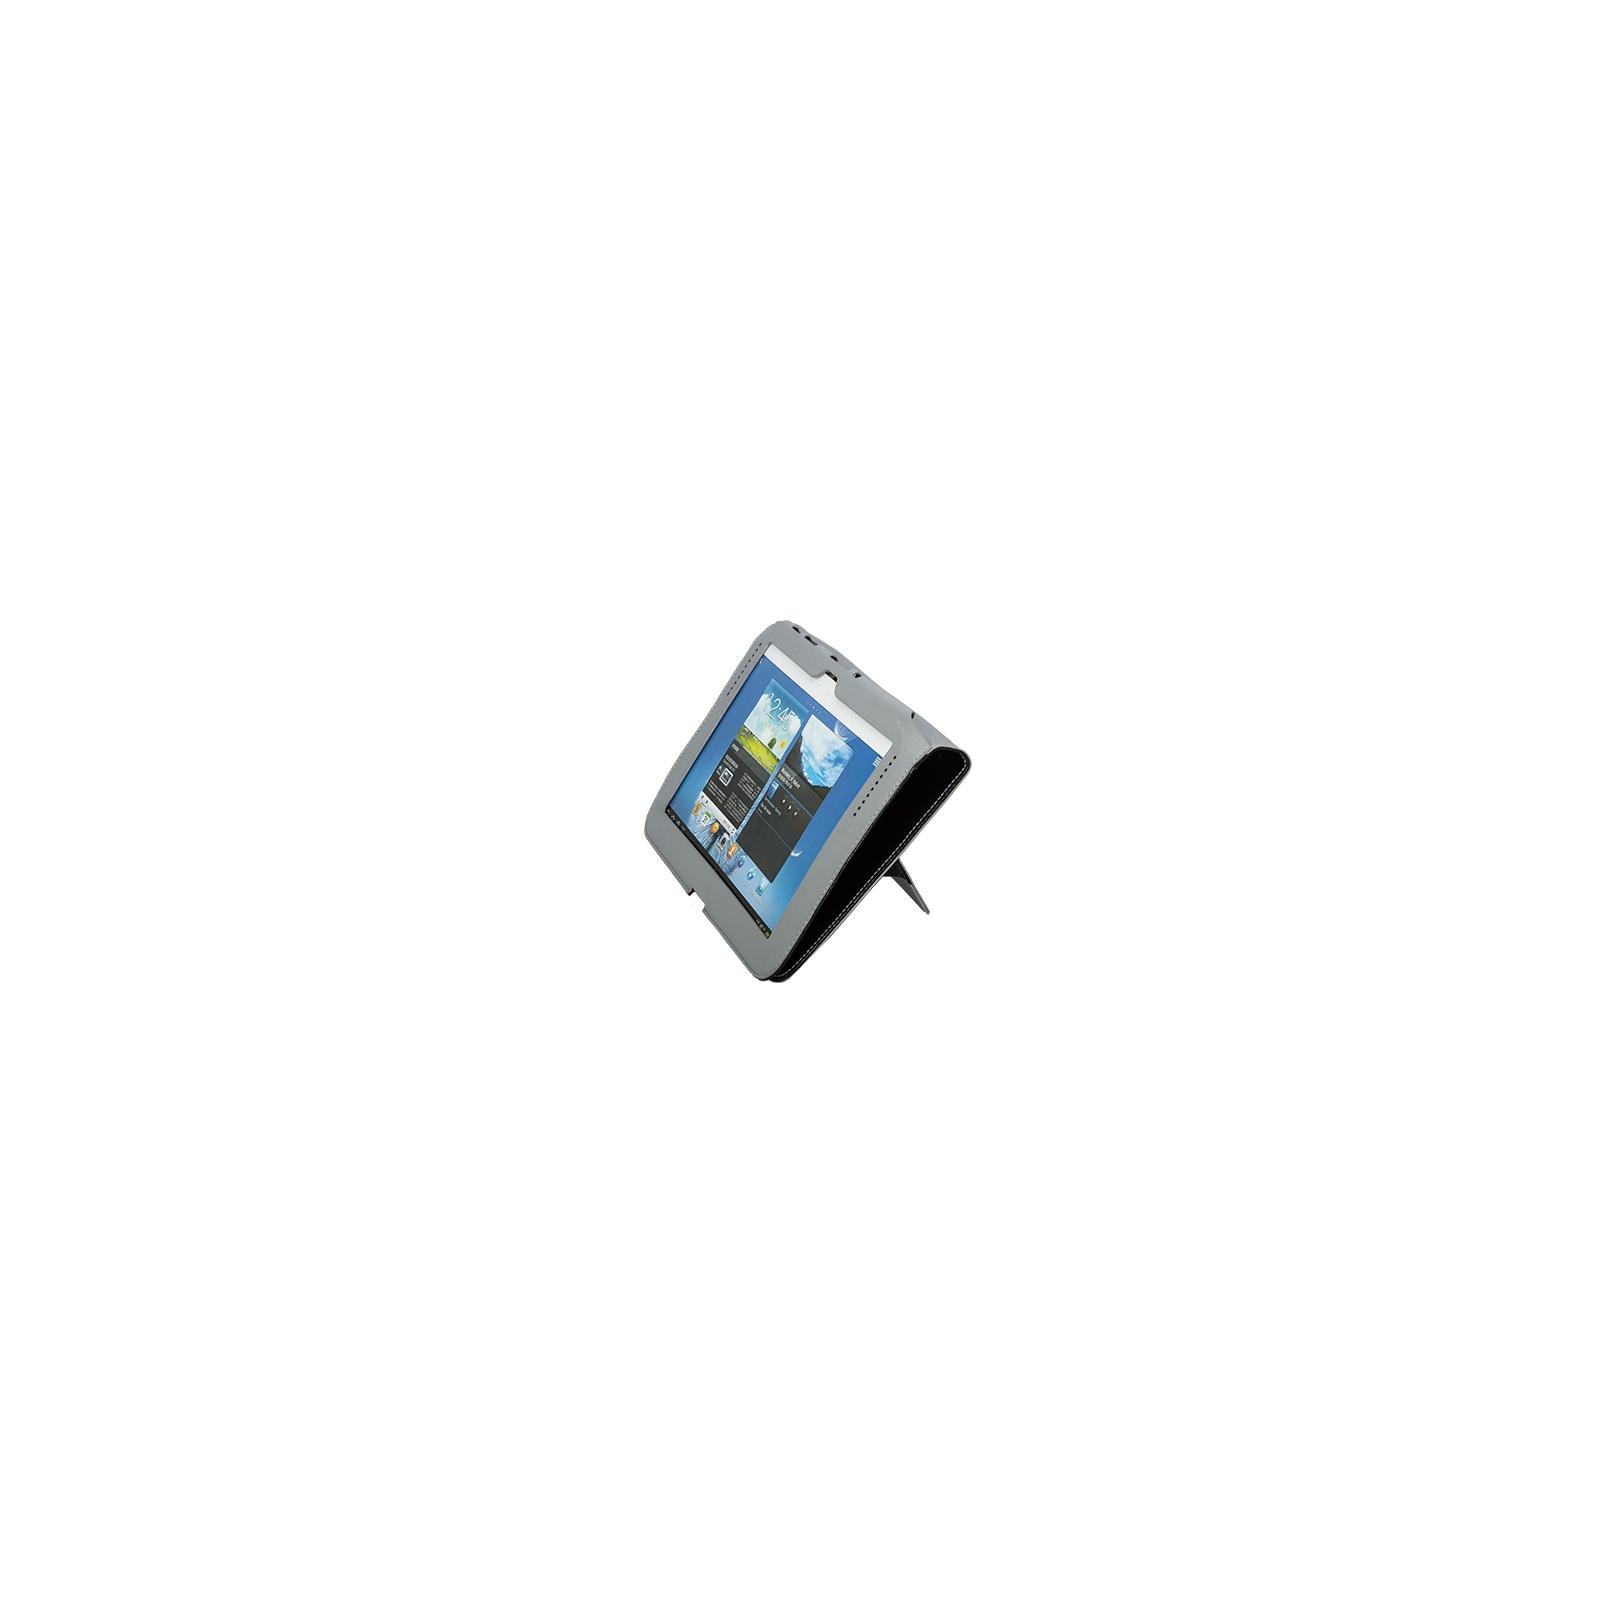 Чехол для планшета Drobak 10.1 Galaxy Note (N8000) Comfort Style/Black (215257) изображение 2